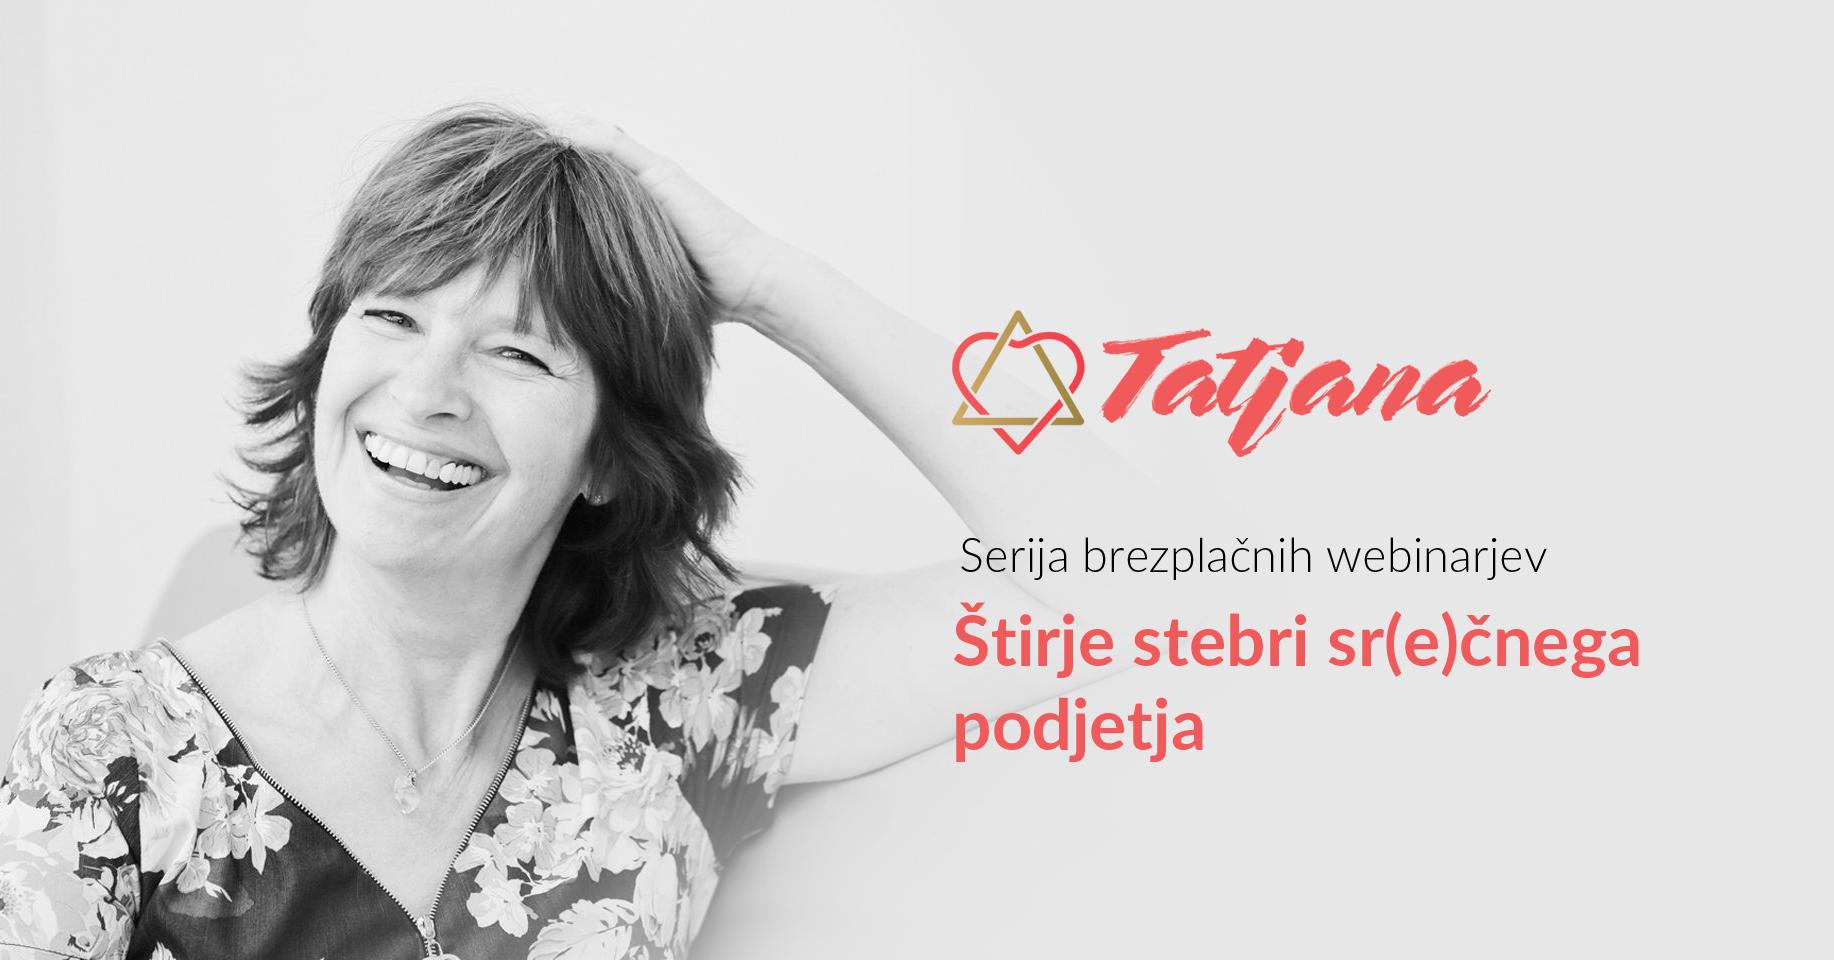 https://tatjanabrumat.si/wp-content/uploads/2018/09/tatjana-brumat-webinarji.png